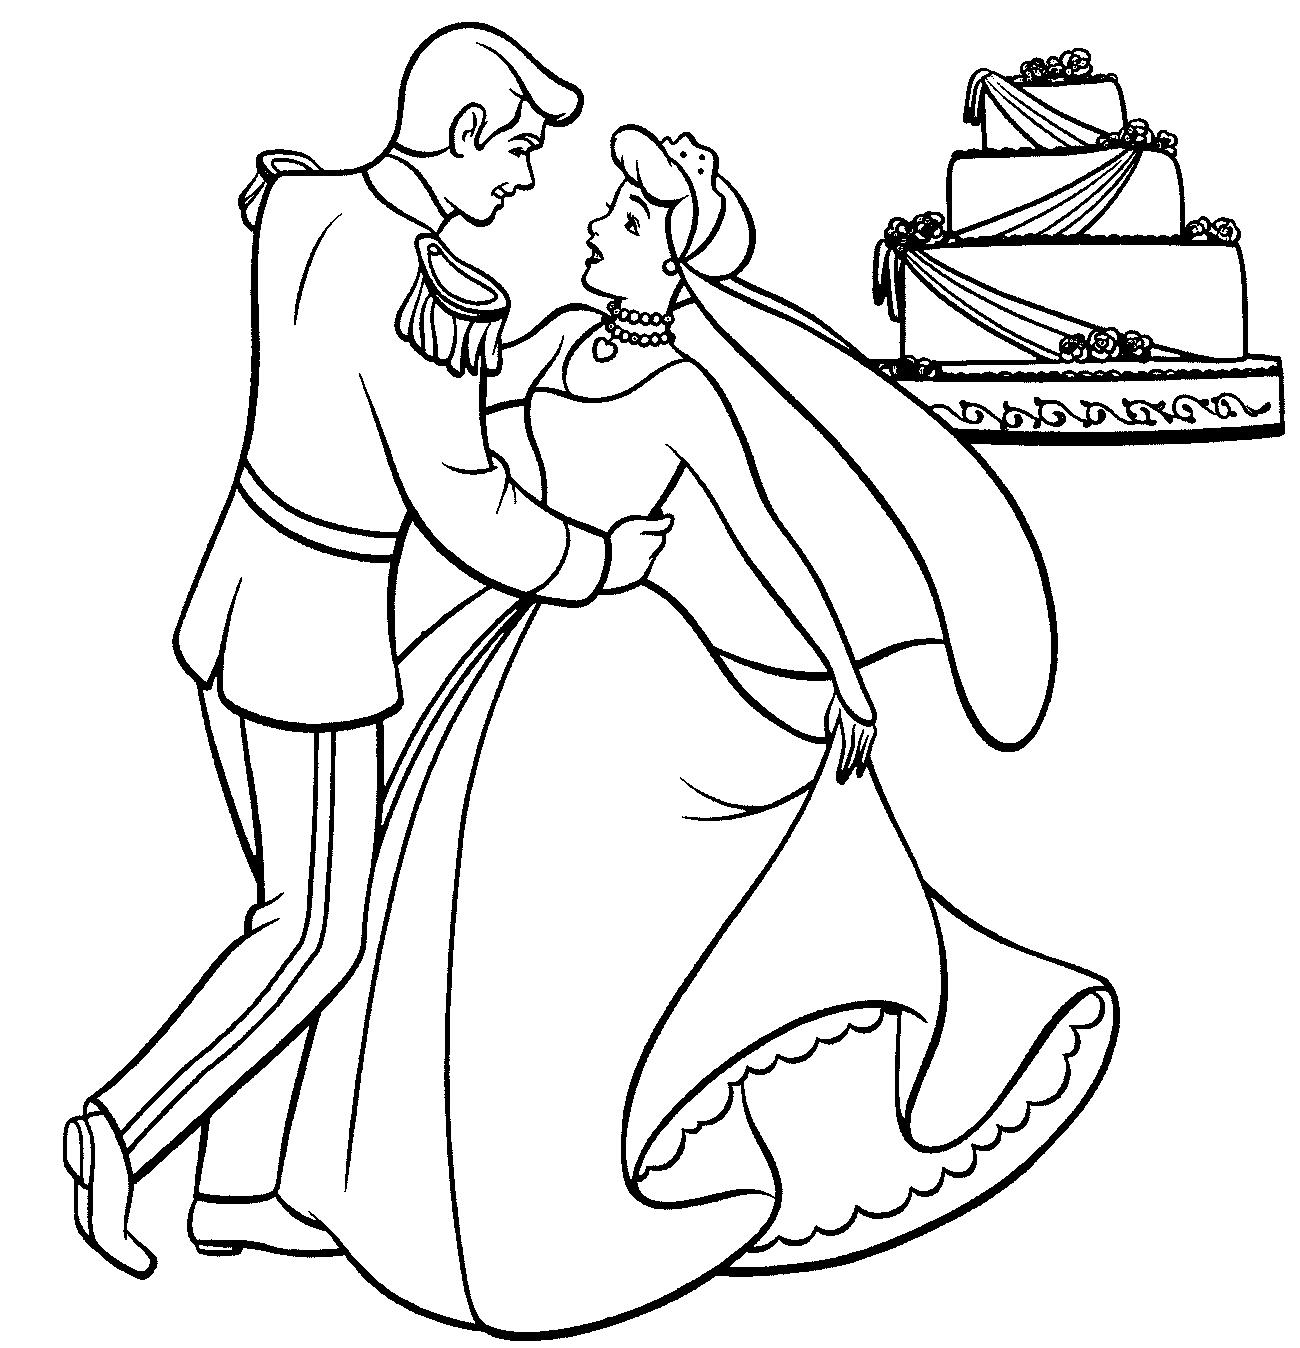 Princess wedding coloring pages - Princess Wedding Coloring Pages Cinderella Wedding Colouring Pages 1300x1348